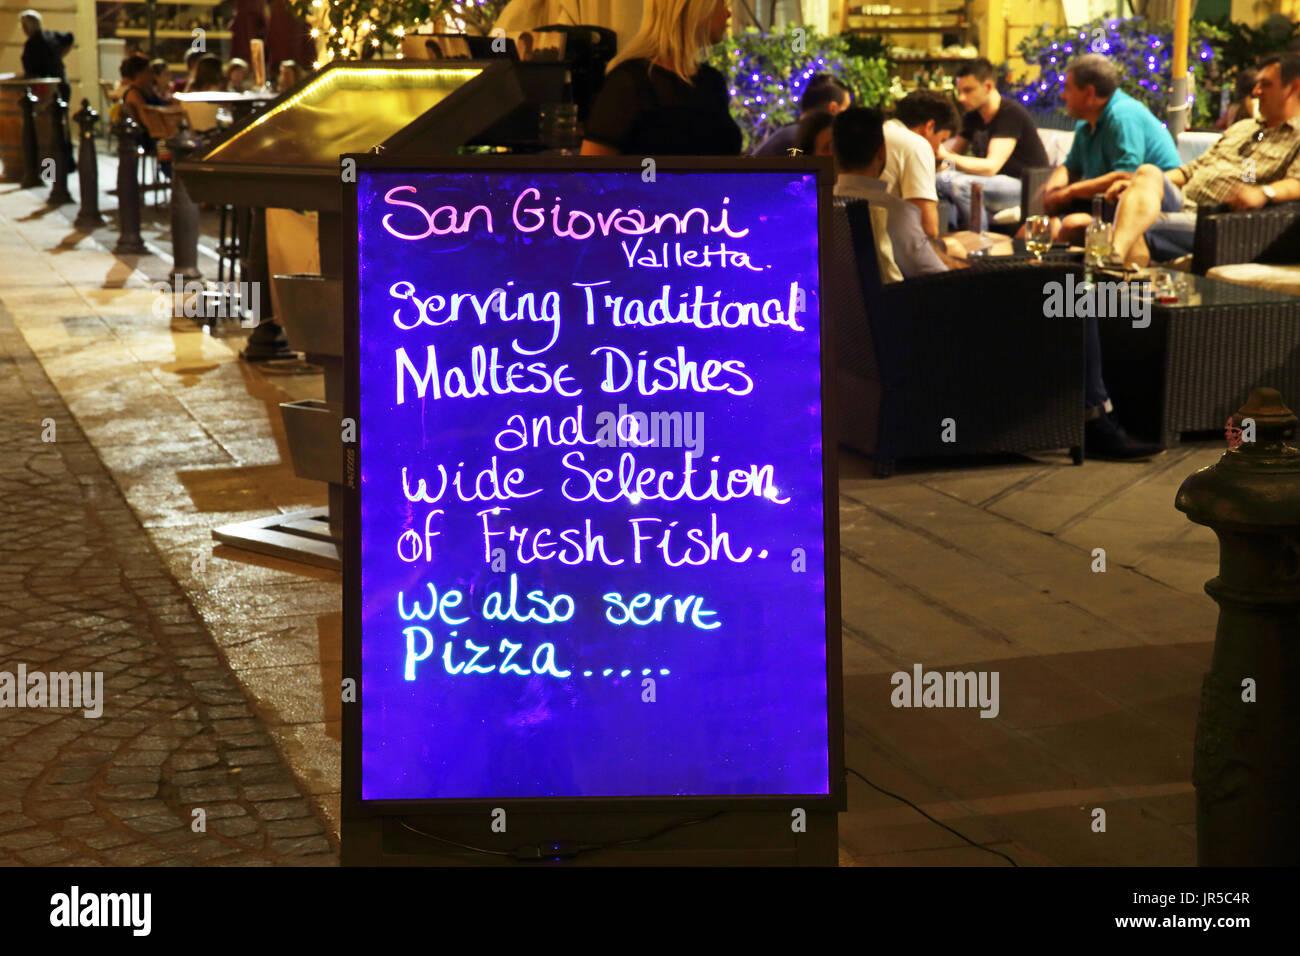 Restaurant menu on St John Square in the evening in Valletta, capital of Malta - Stock Image